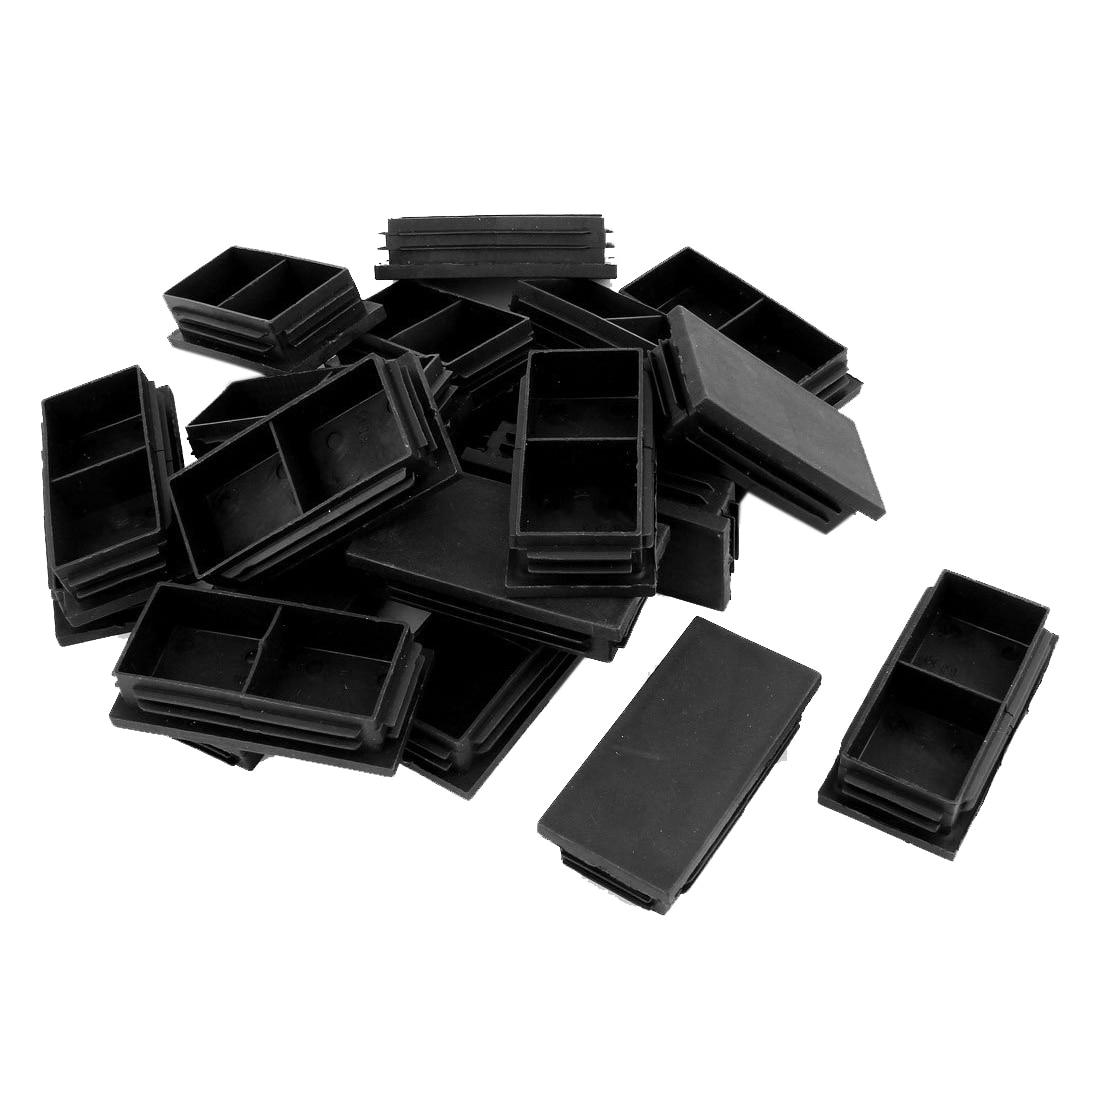 Hot Sale Plastic Rectangle Blanking End Caps Bung 40mm X 80mm 20Pcs Black